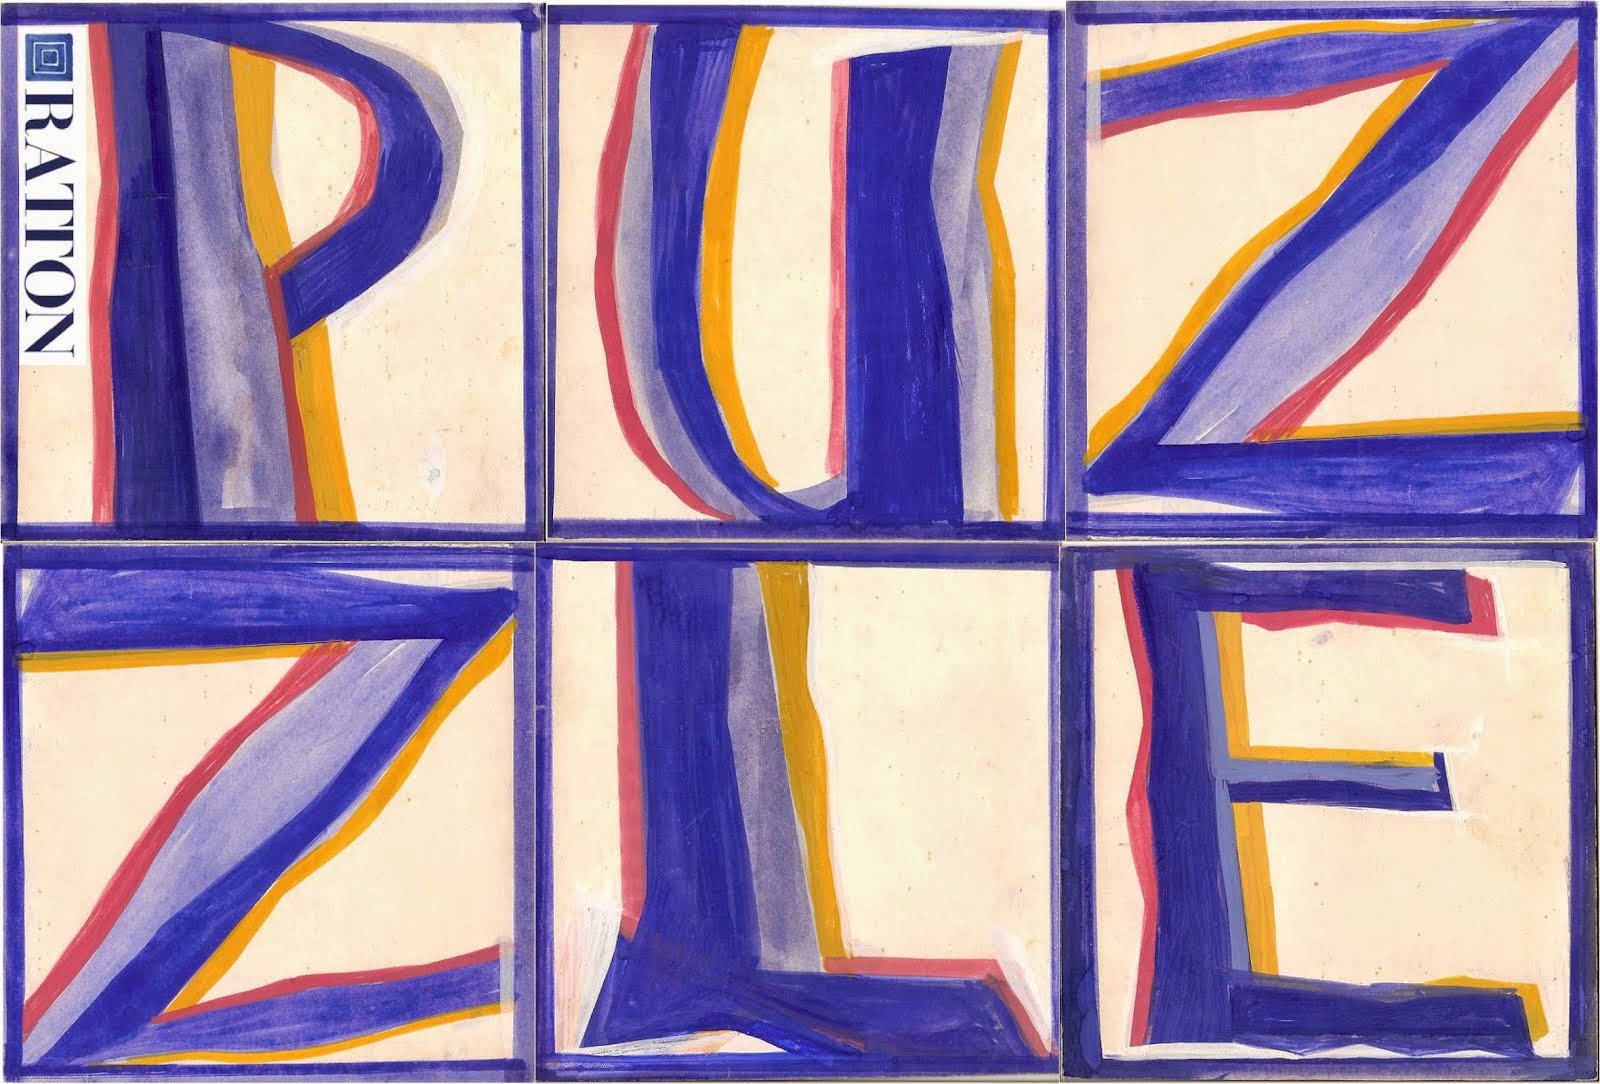 Puzzle 14x14 Setembro 2014